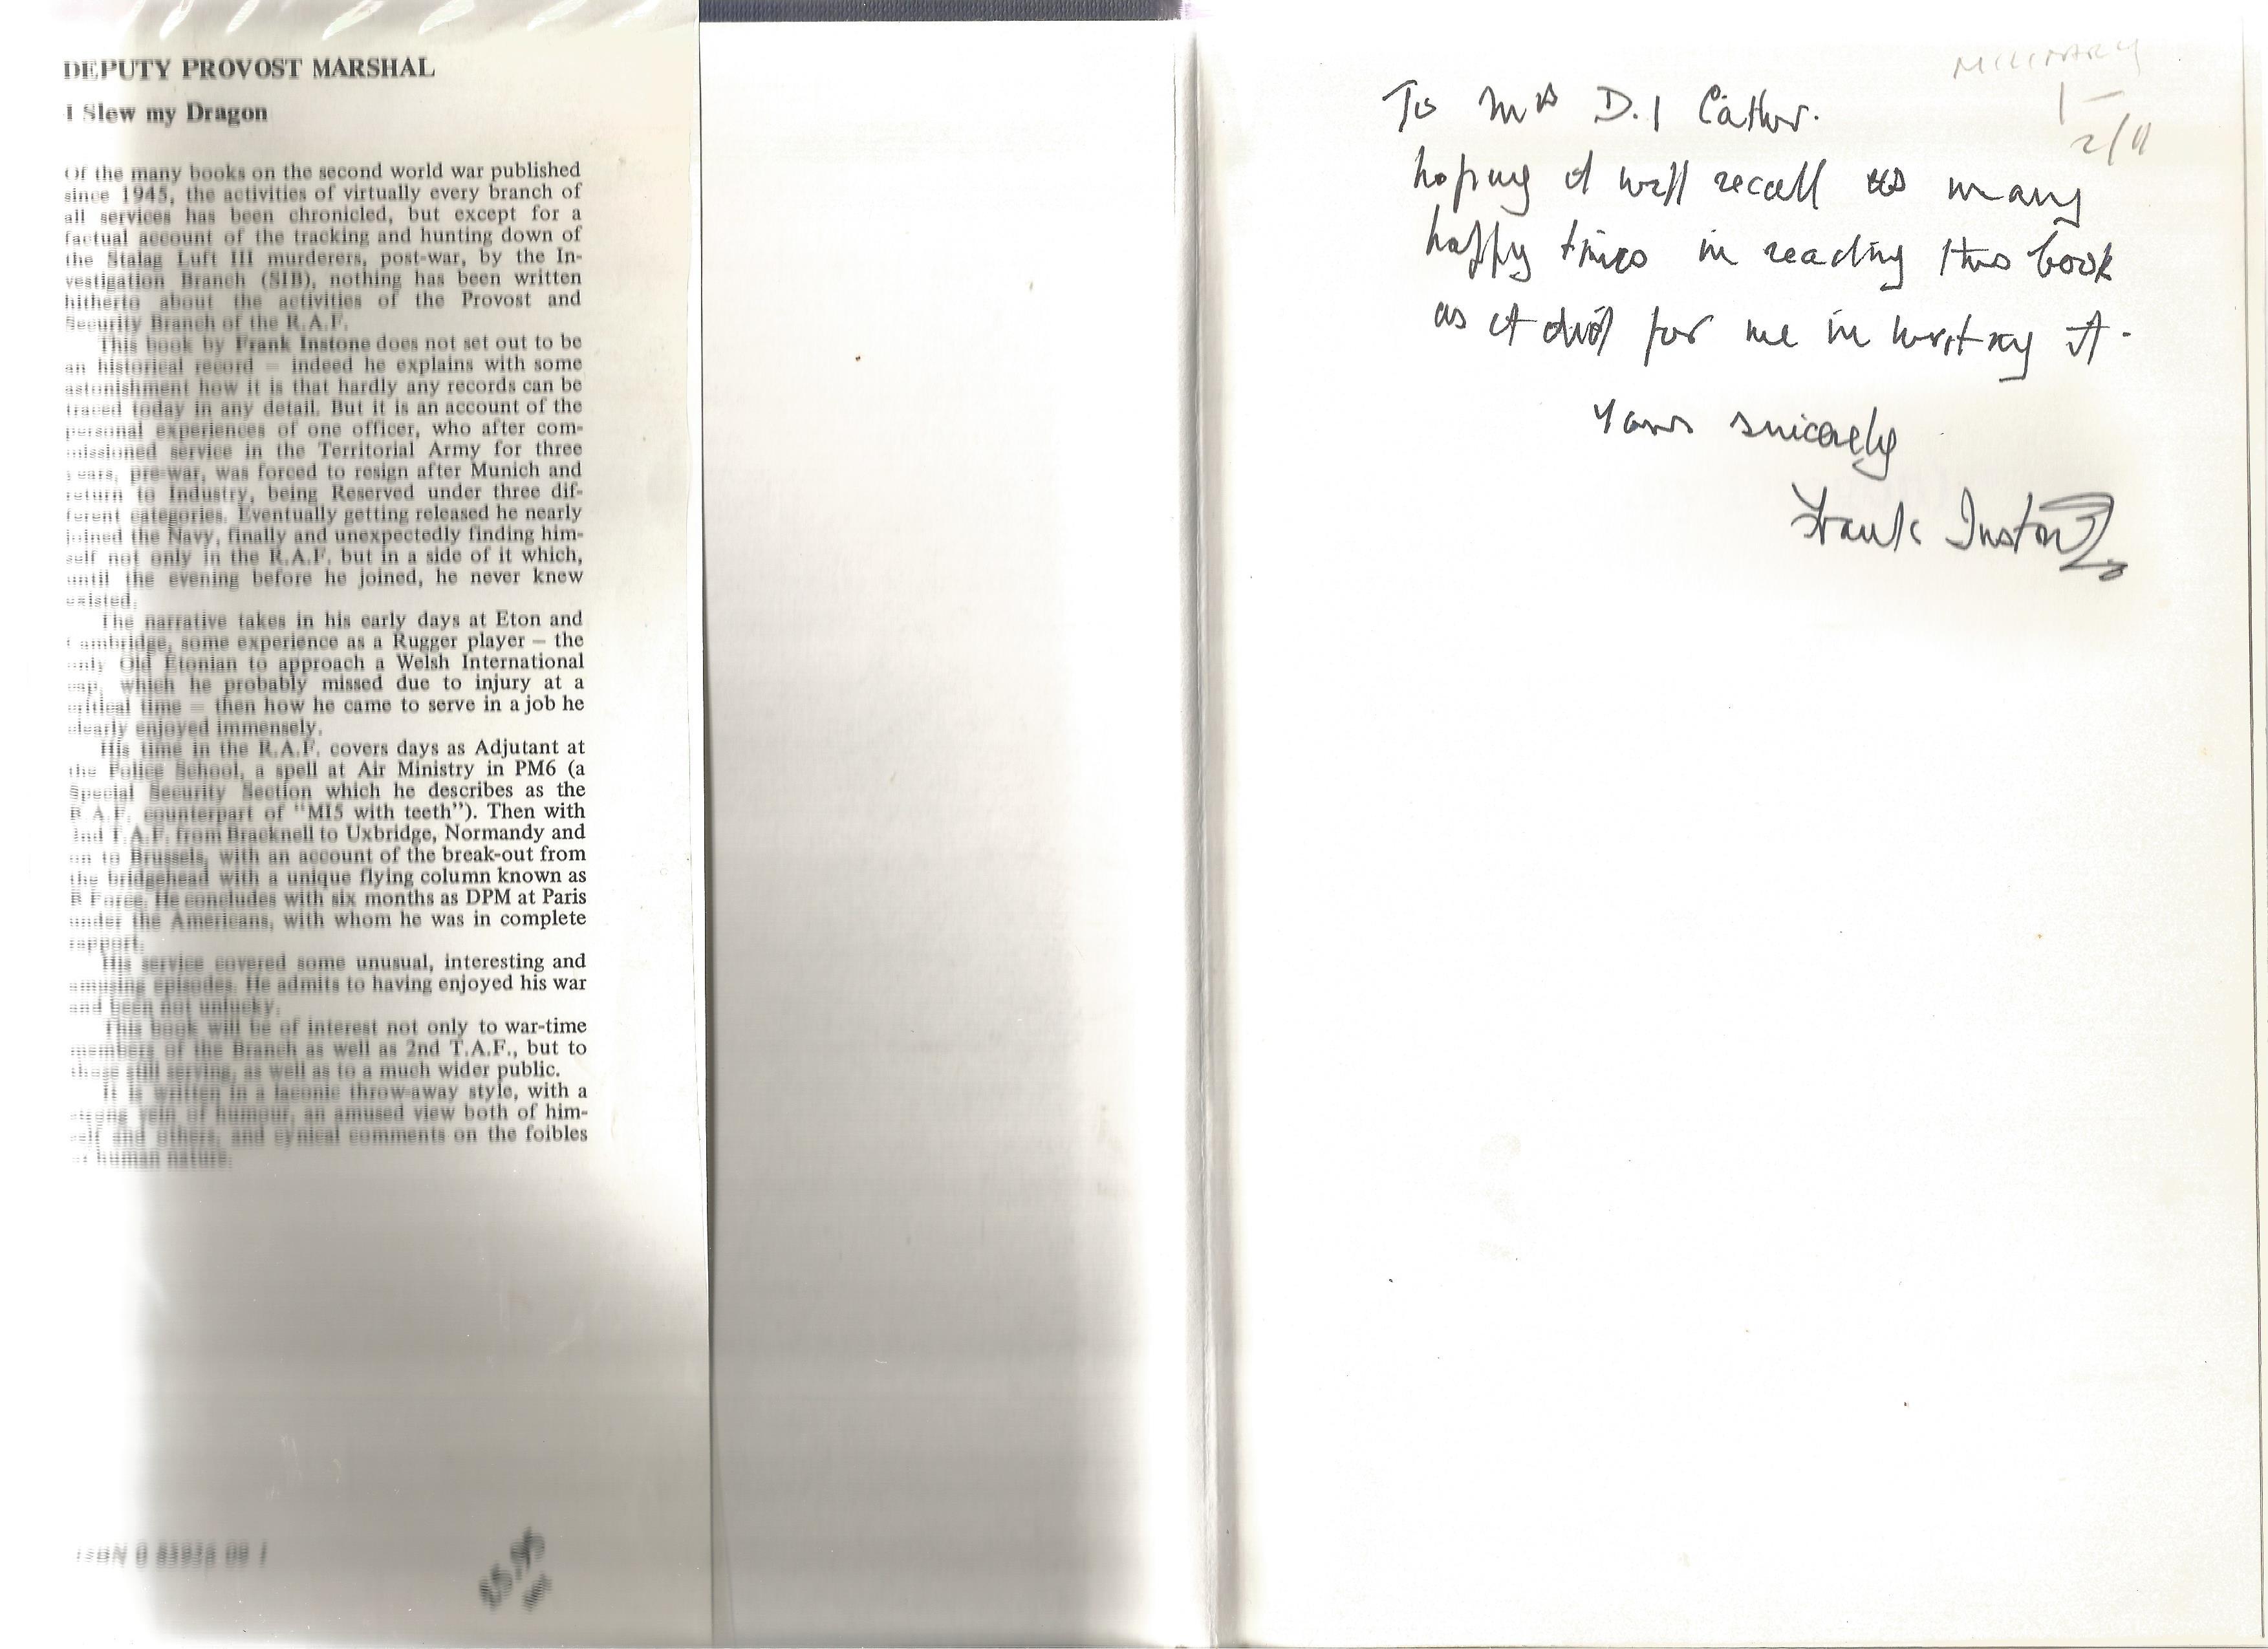 F A Instone. Deputy Provost Marshal D.P.M I Slew My Dragon. A WW2 hardback First edition book. - Image 2 of 3